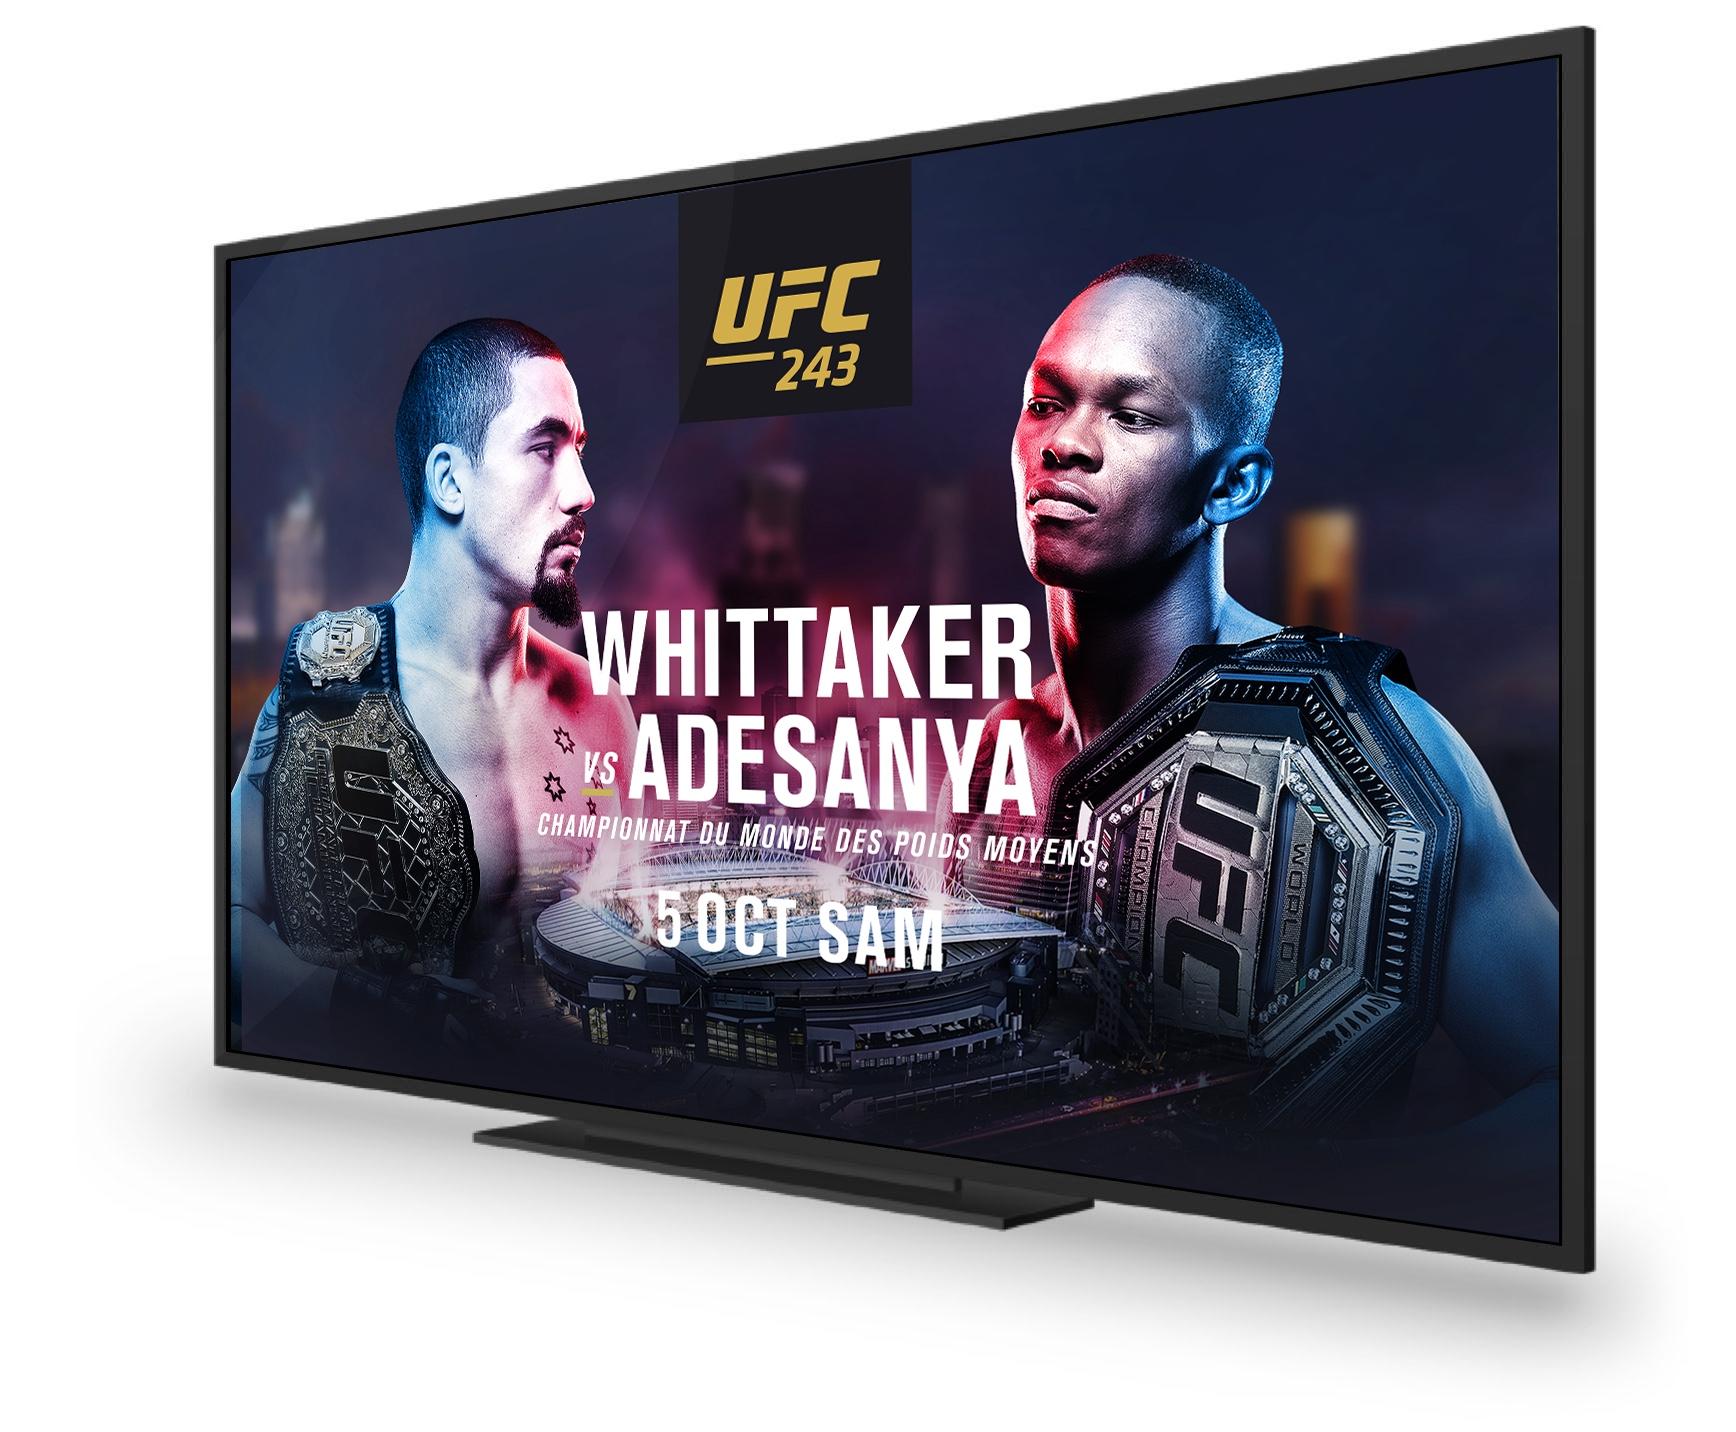 UFC 243: Whittaker VS Adesanya. Saturday, Oct 5th